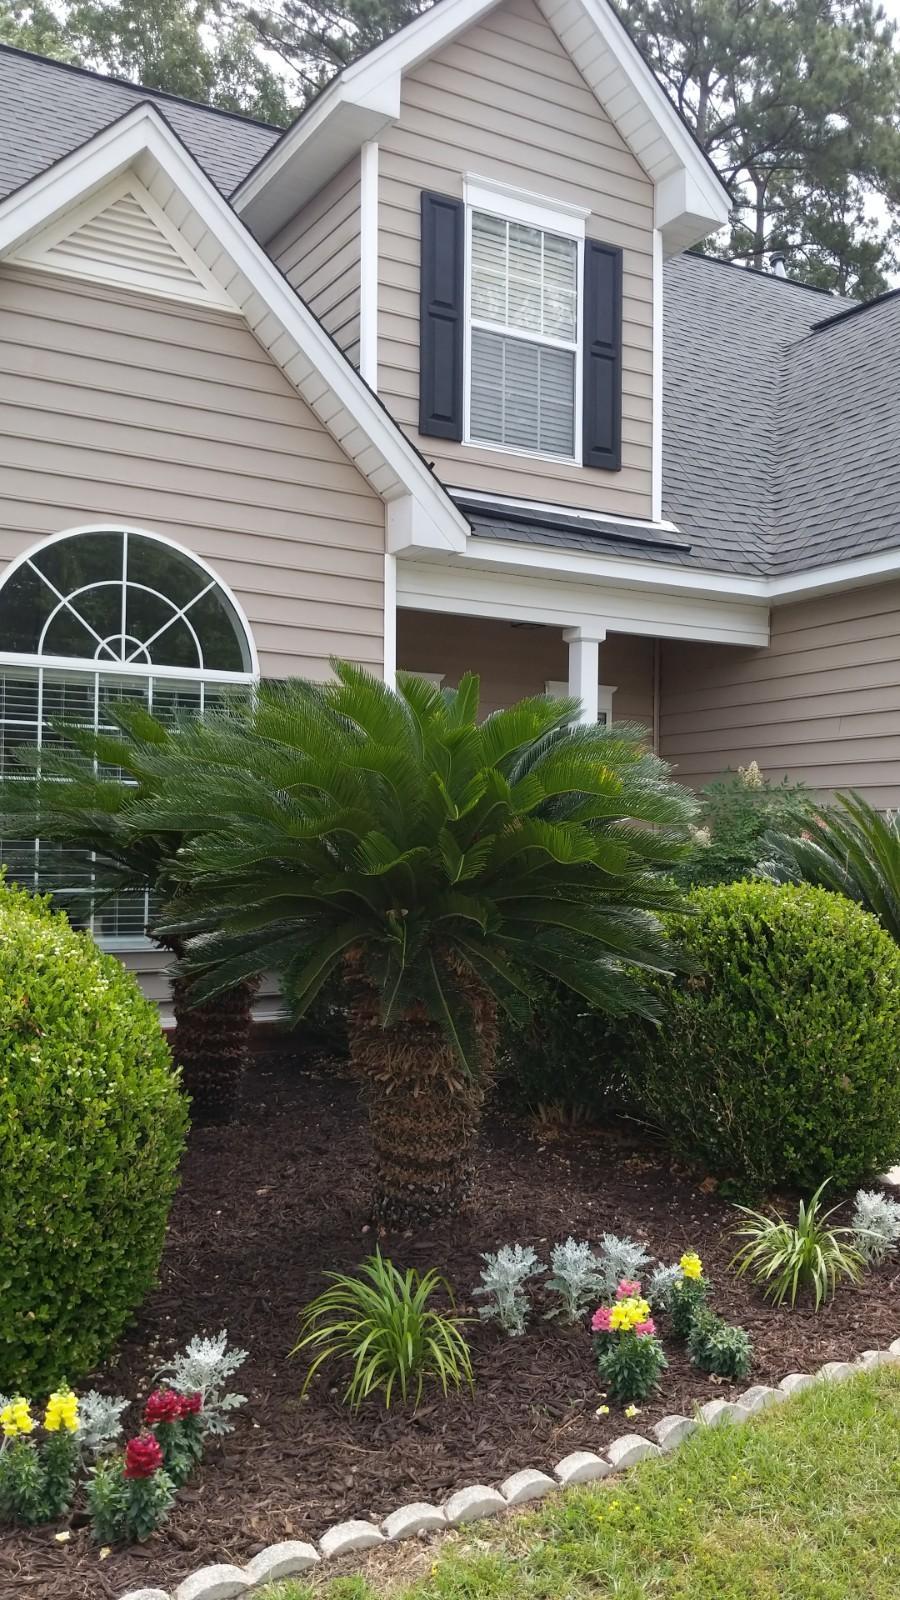 Park West Homes For Sale - 1337 Heidiho, Mount Pleasant, SC - 38